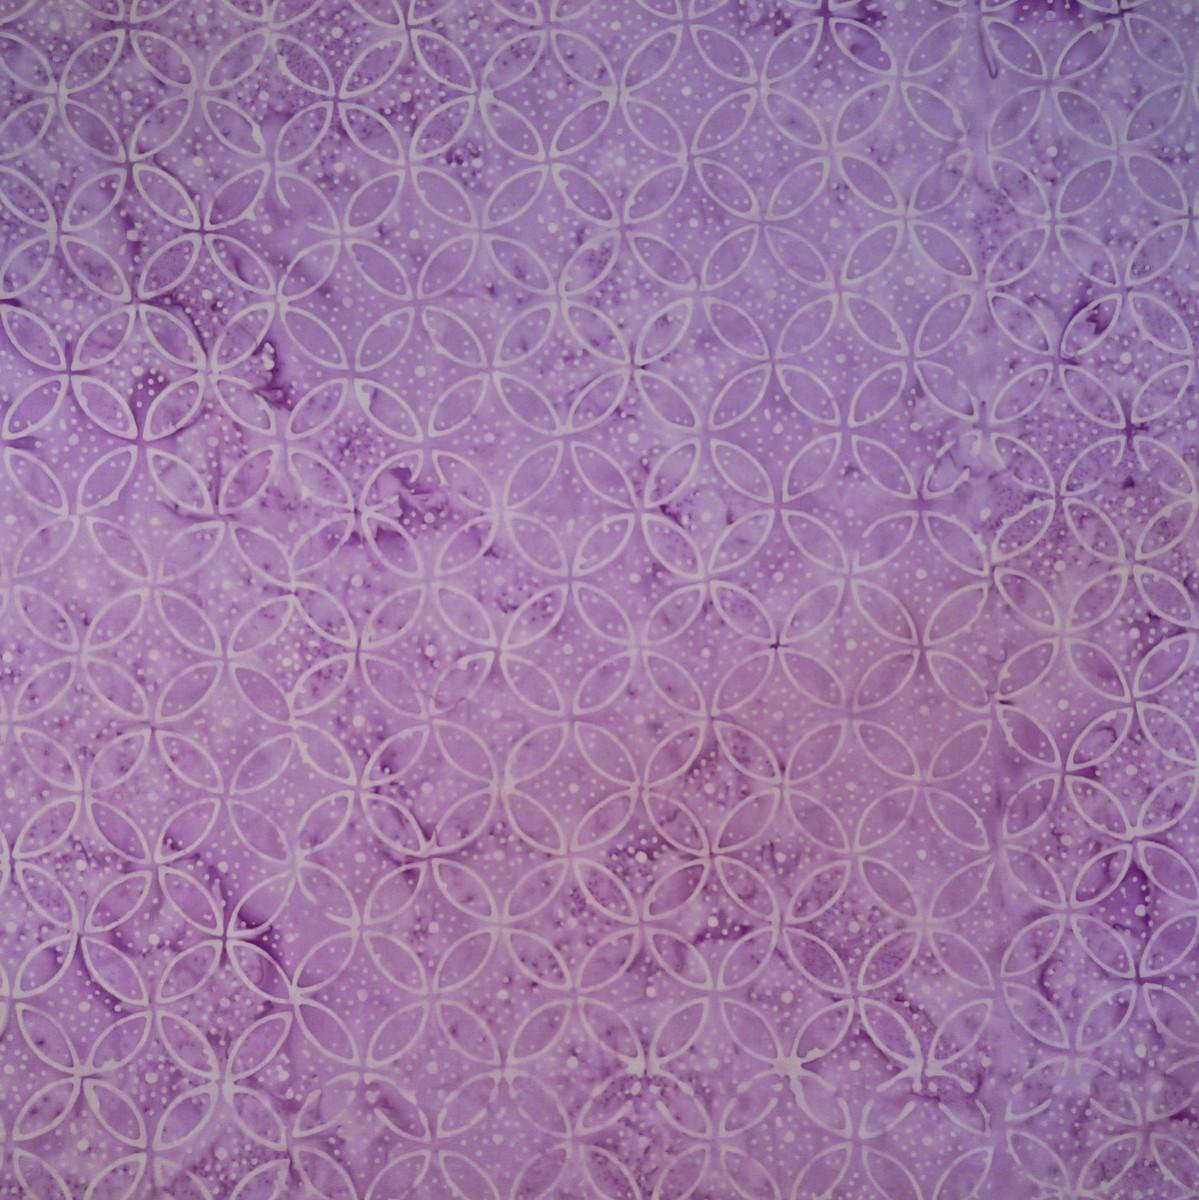 PM-15-3325 Gentle Lavender